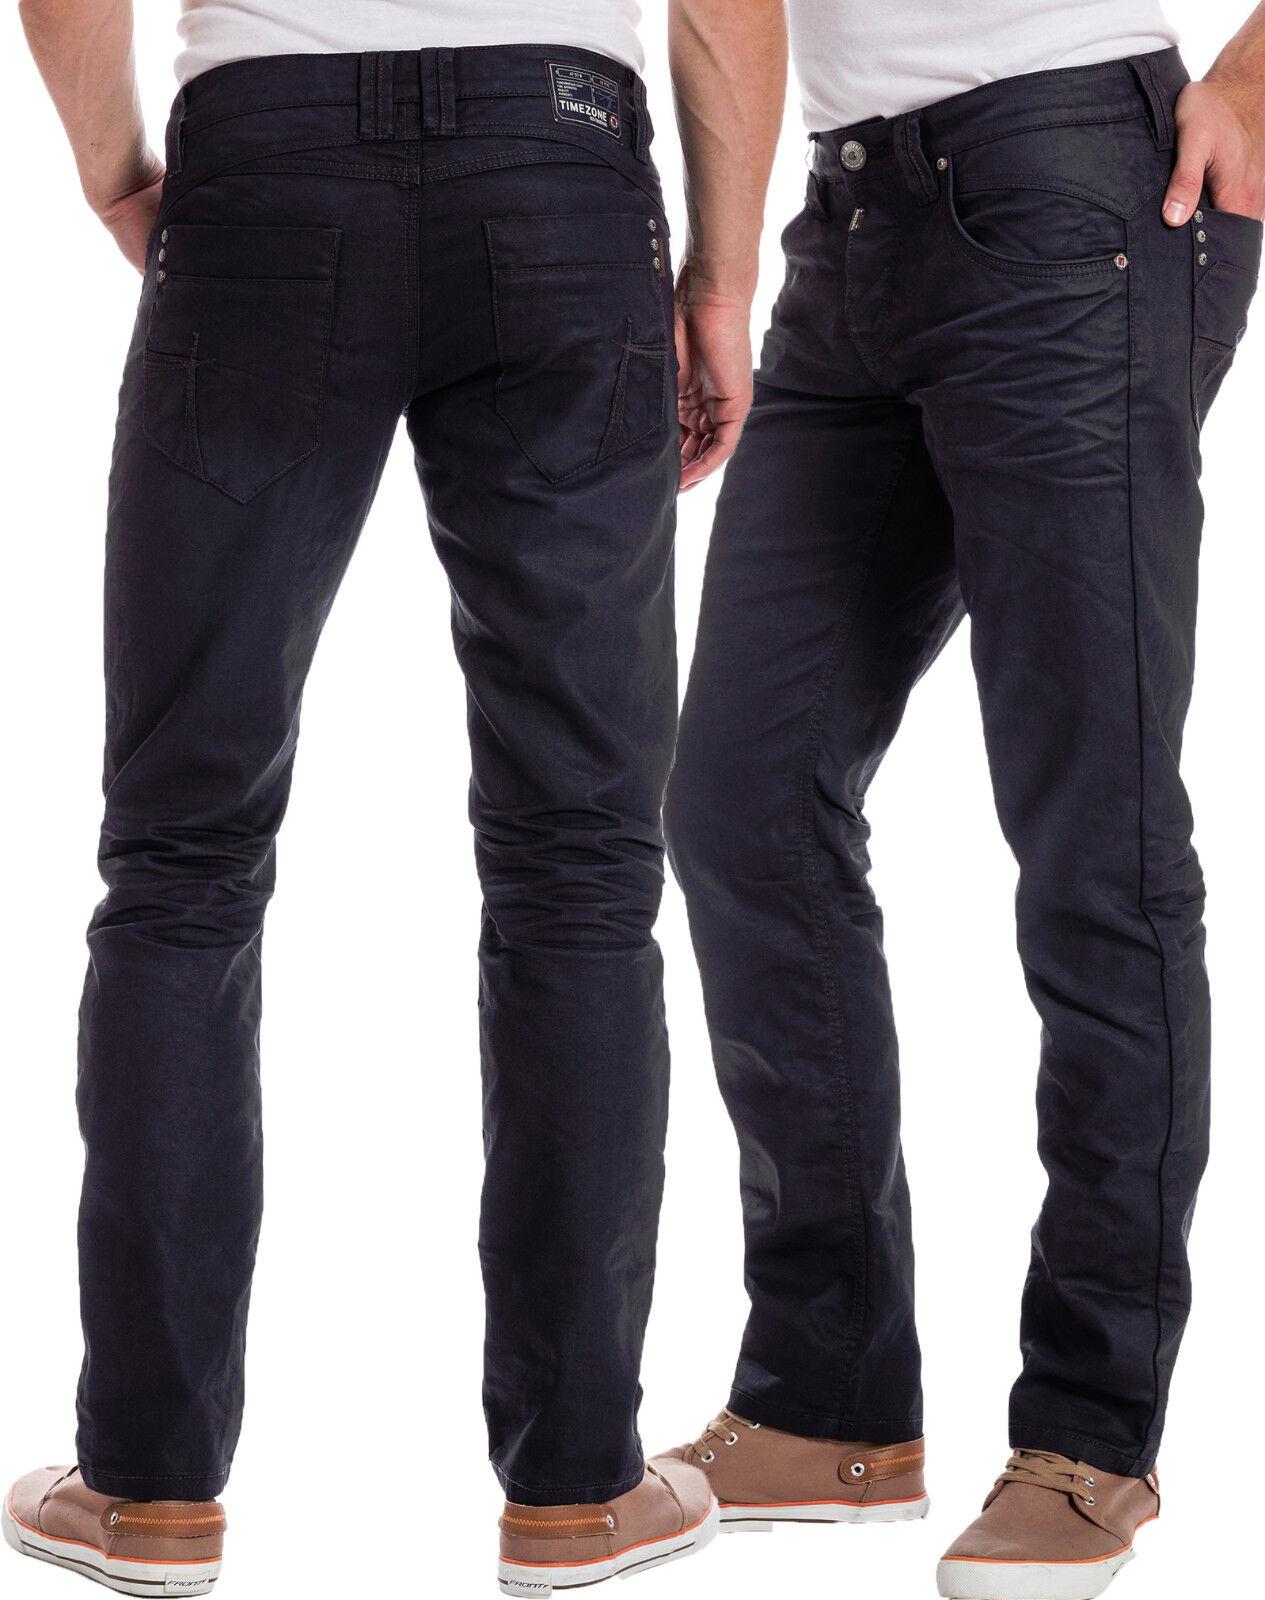 TIMEZONE Jeans Uomo Taylor 3452 dull WASH PANTALONI JEANS BLU SLIM FIT NUOVO